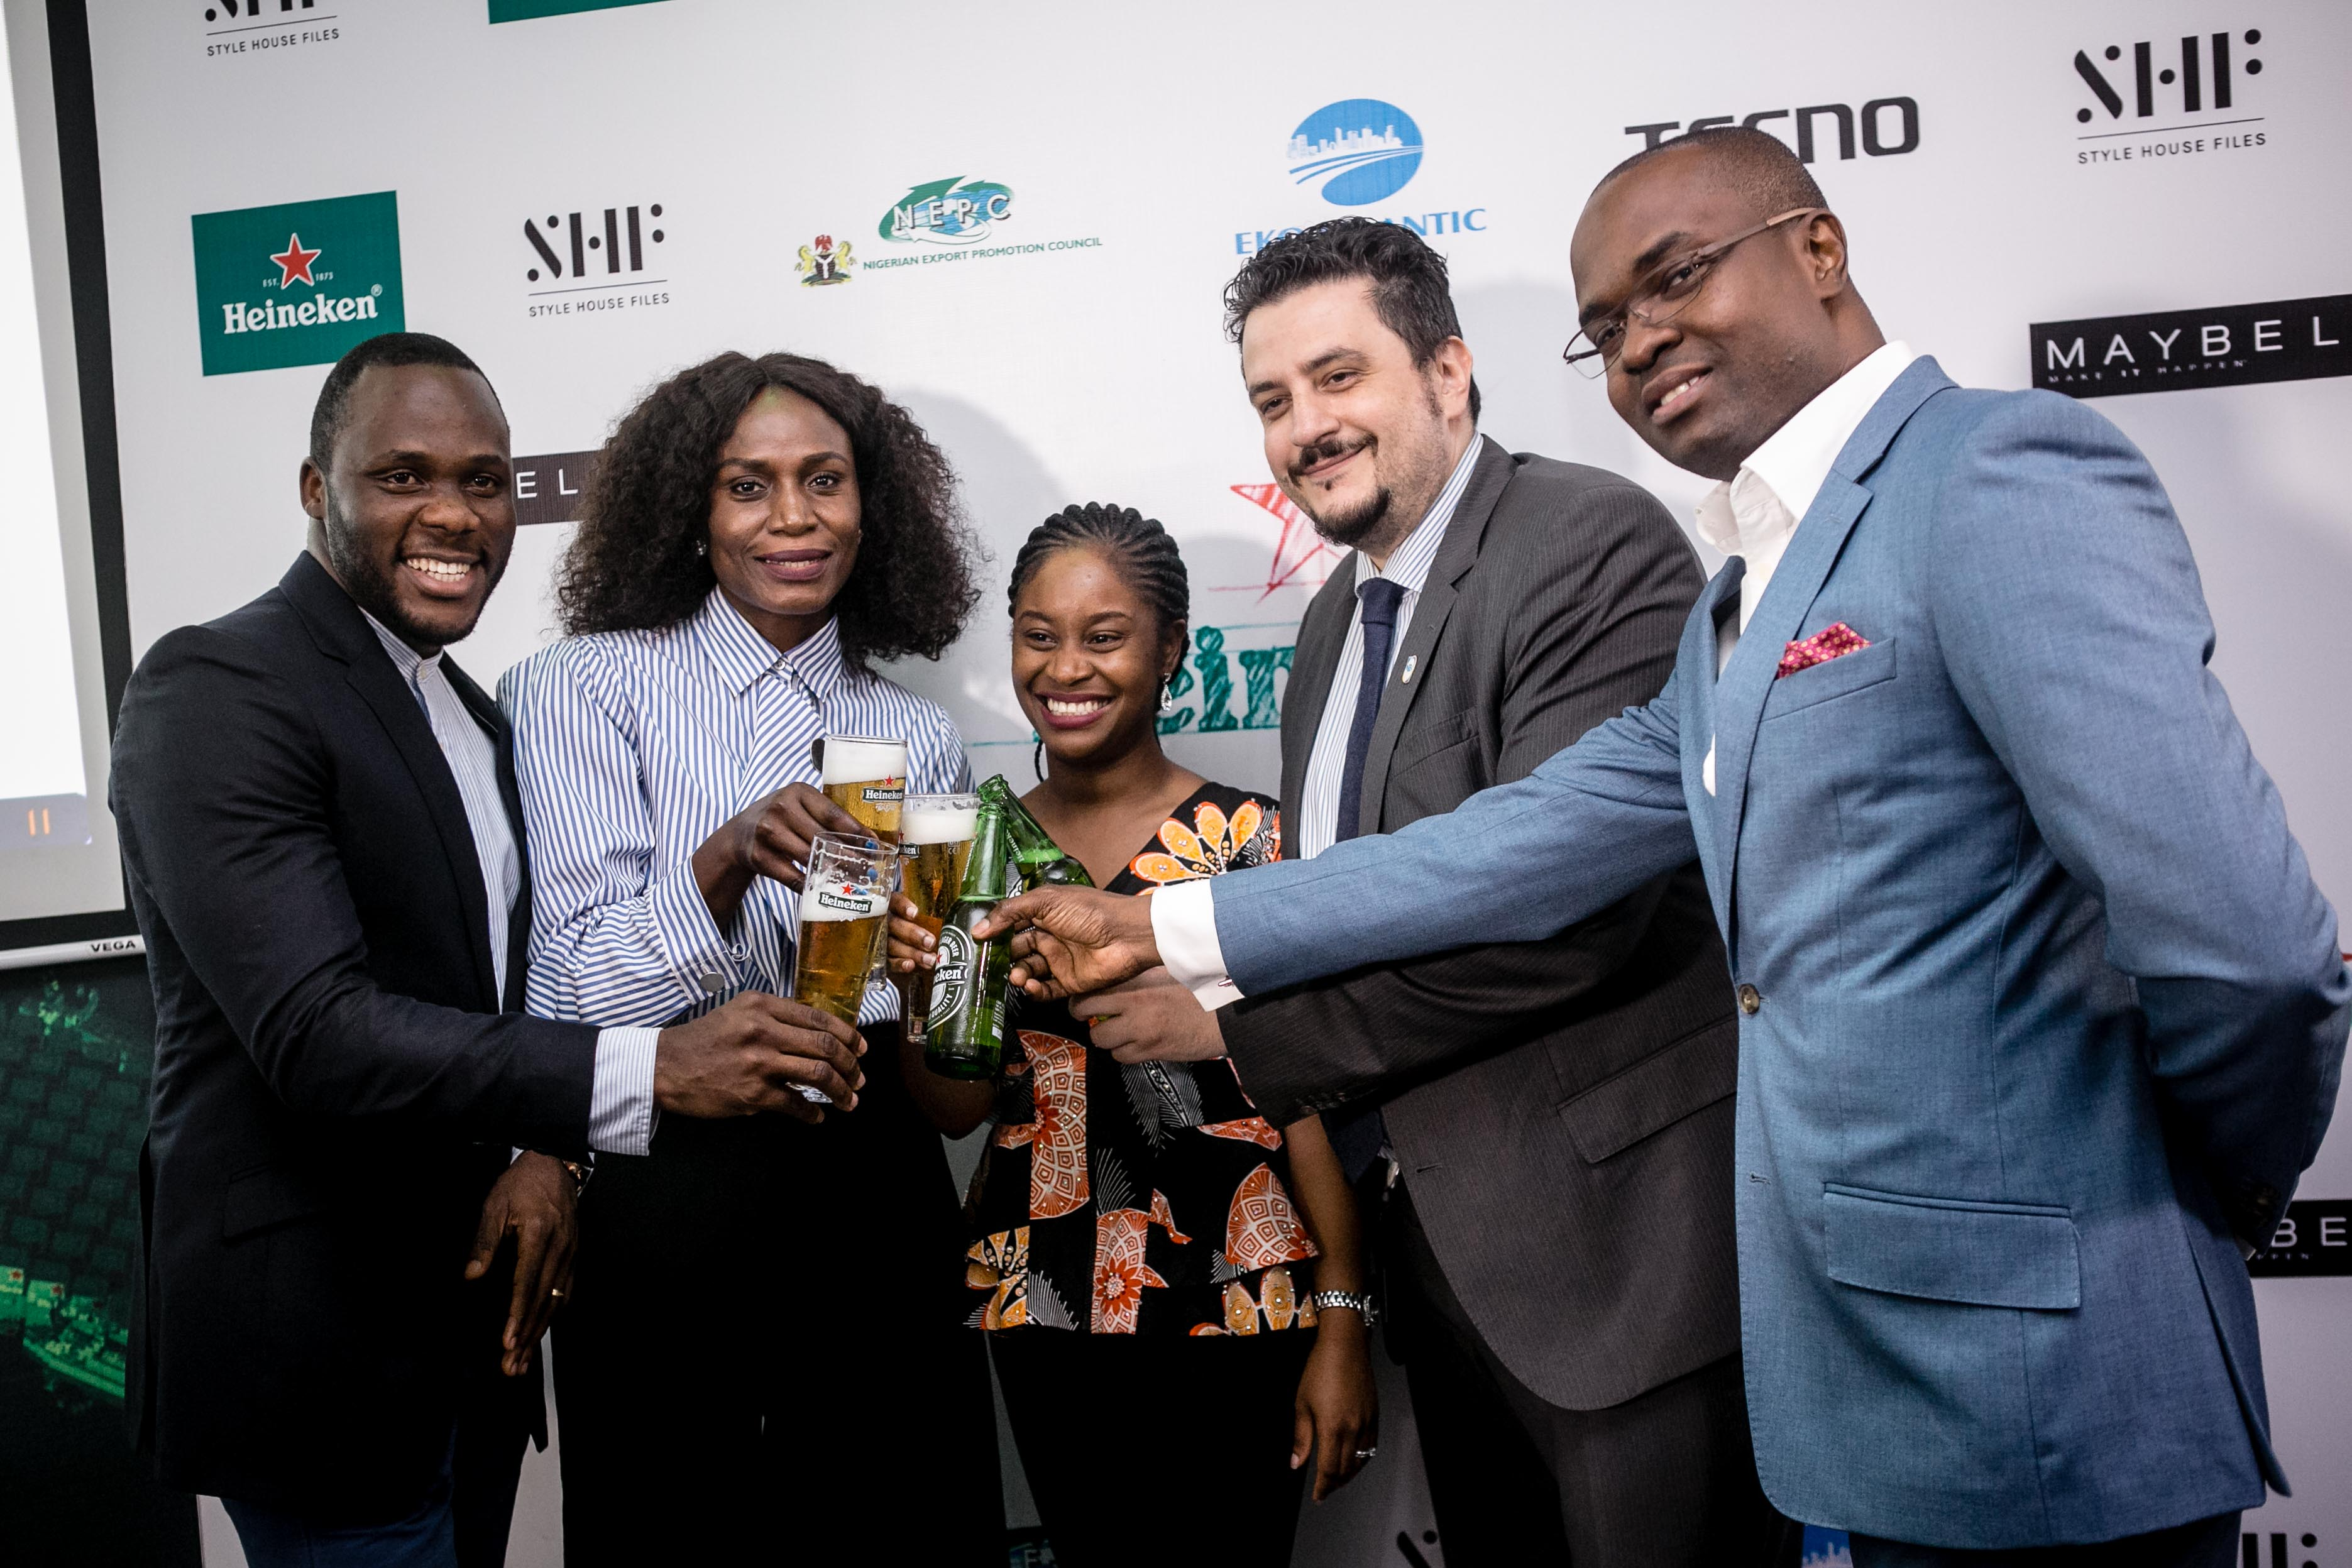 L-R:Senior Brand Manager, Heineken,Obabiyi Fagade; Founder, Style House Files & LFDW,Omoyemi Akerele; Assistant Brand Manager, Heineken,Aminah Jagun;Marketing Director, NB Plc,Franco Maria Maggi; and Portfolio Manager International and National Brands, NB Plc,Tokunbo Adodoat the#HeinekenLFDW17Press Cocktail held at the Heineken House, Ikoyi, Lagos on Friday